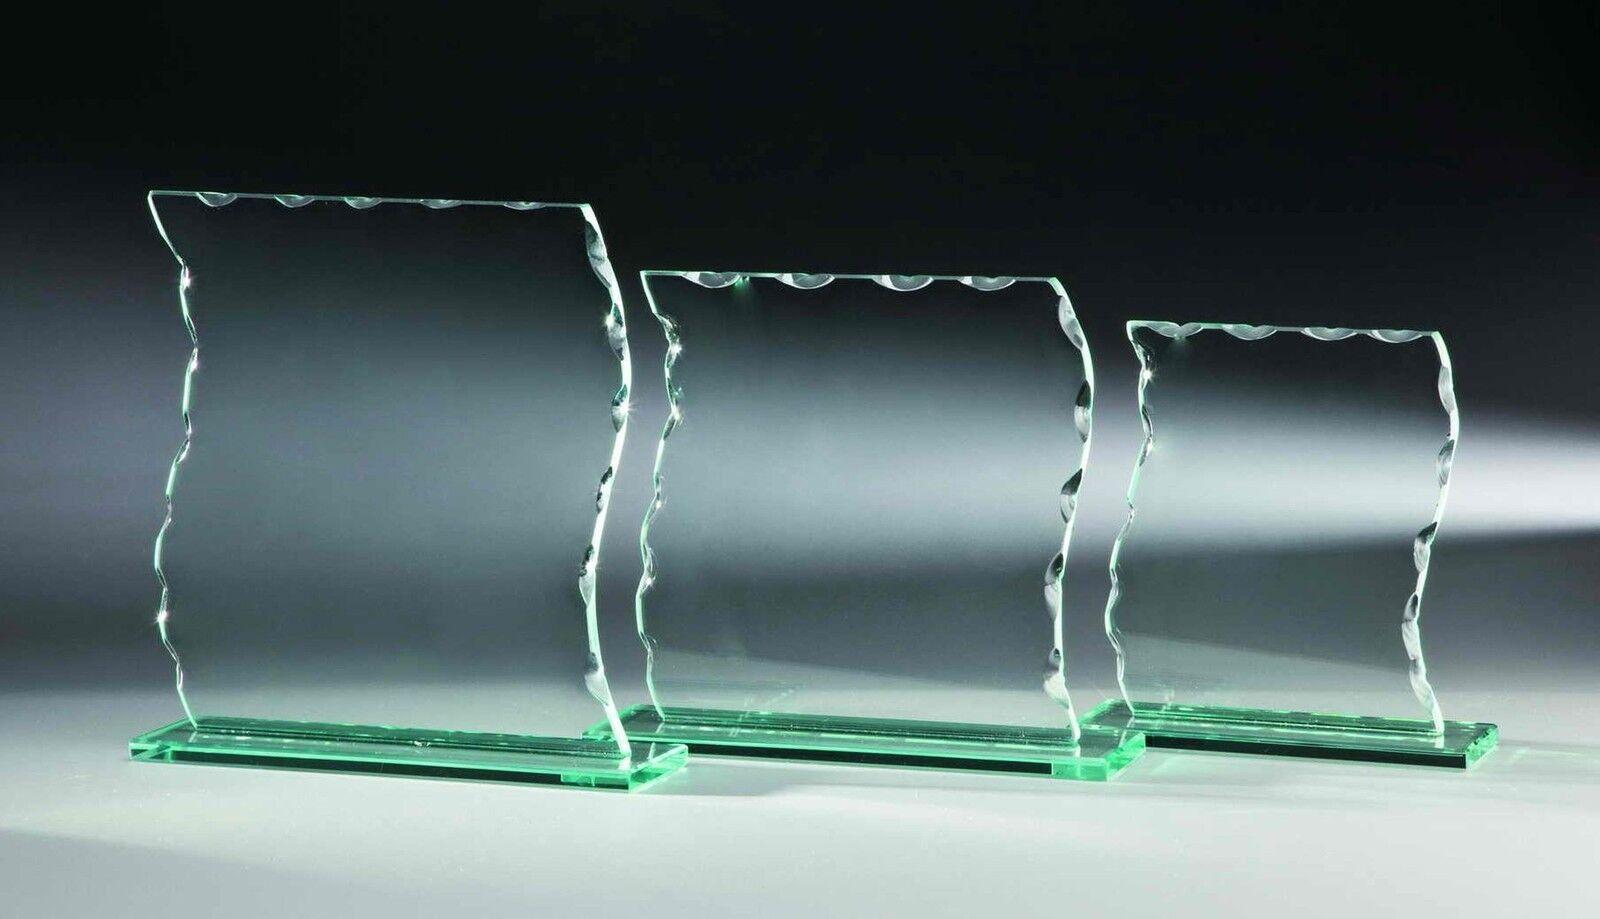 10 Glas-Trophäen Wellenschliff 21x19cm  15 (Glaspokale Pokal Pokal Pokal Gravur Pokale) a4612f